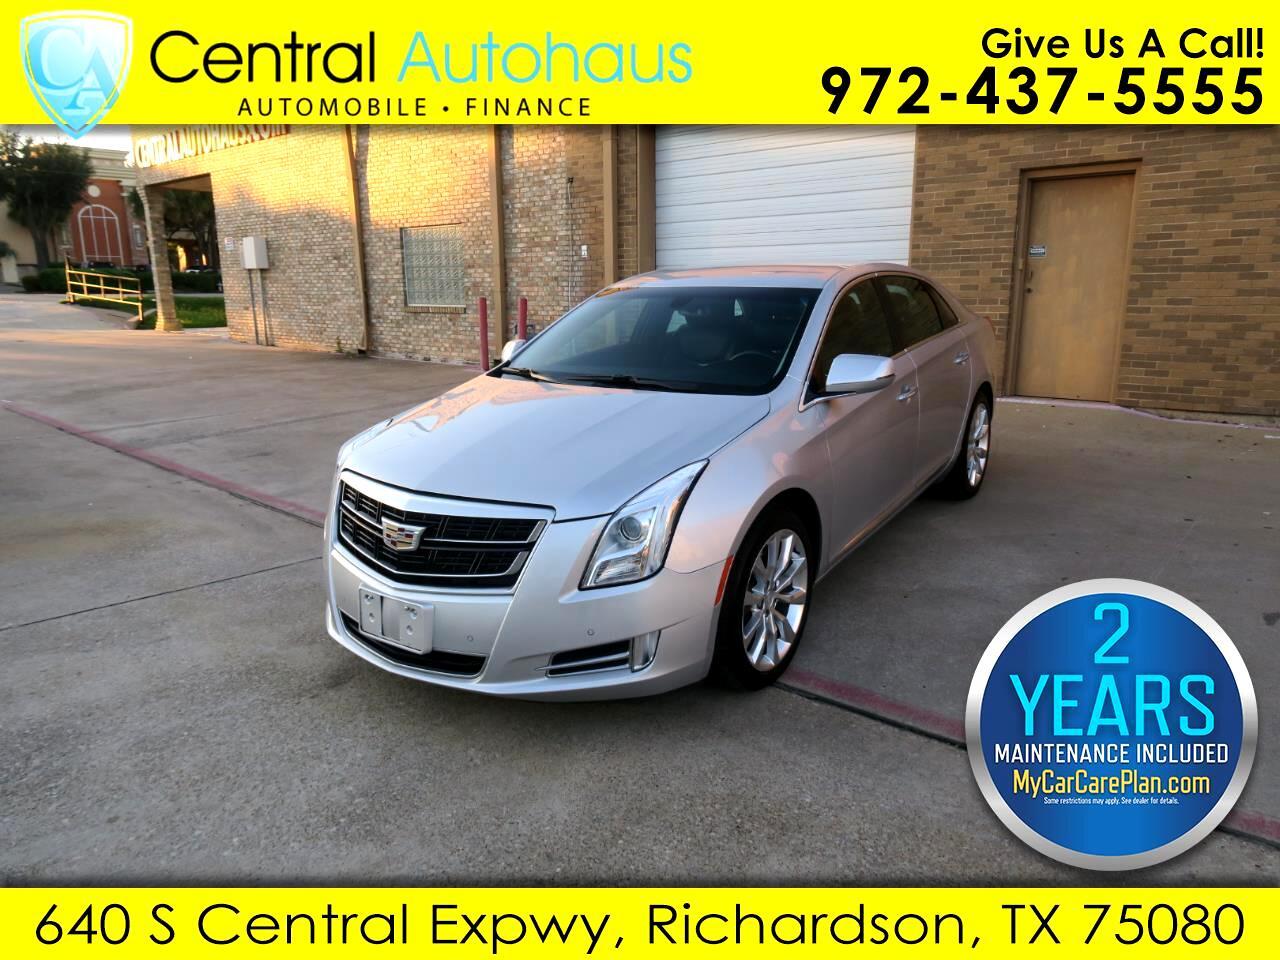 2017 Cadillac XTS 4dr Sdn Luxury AWD